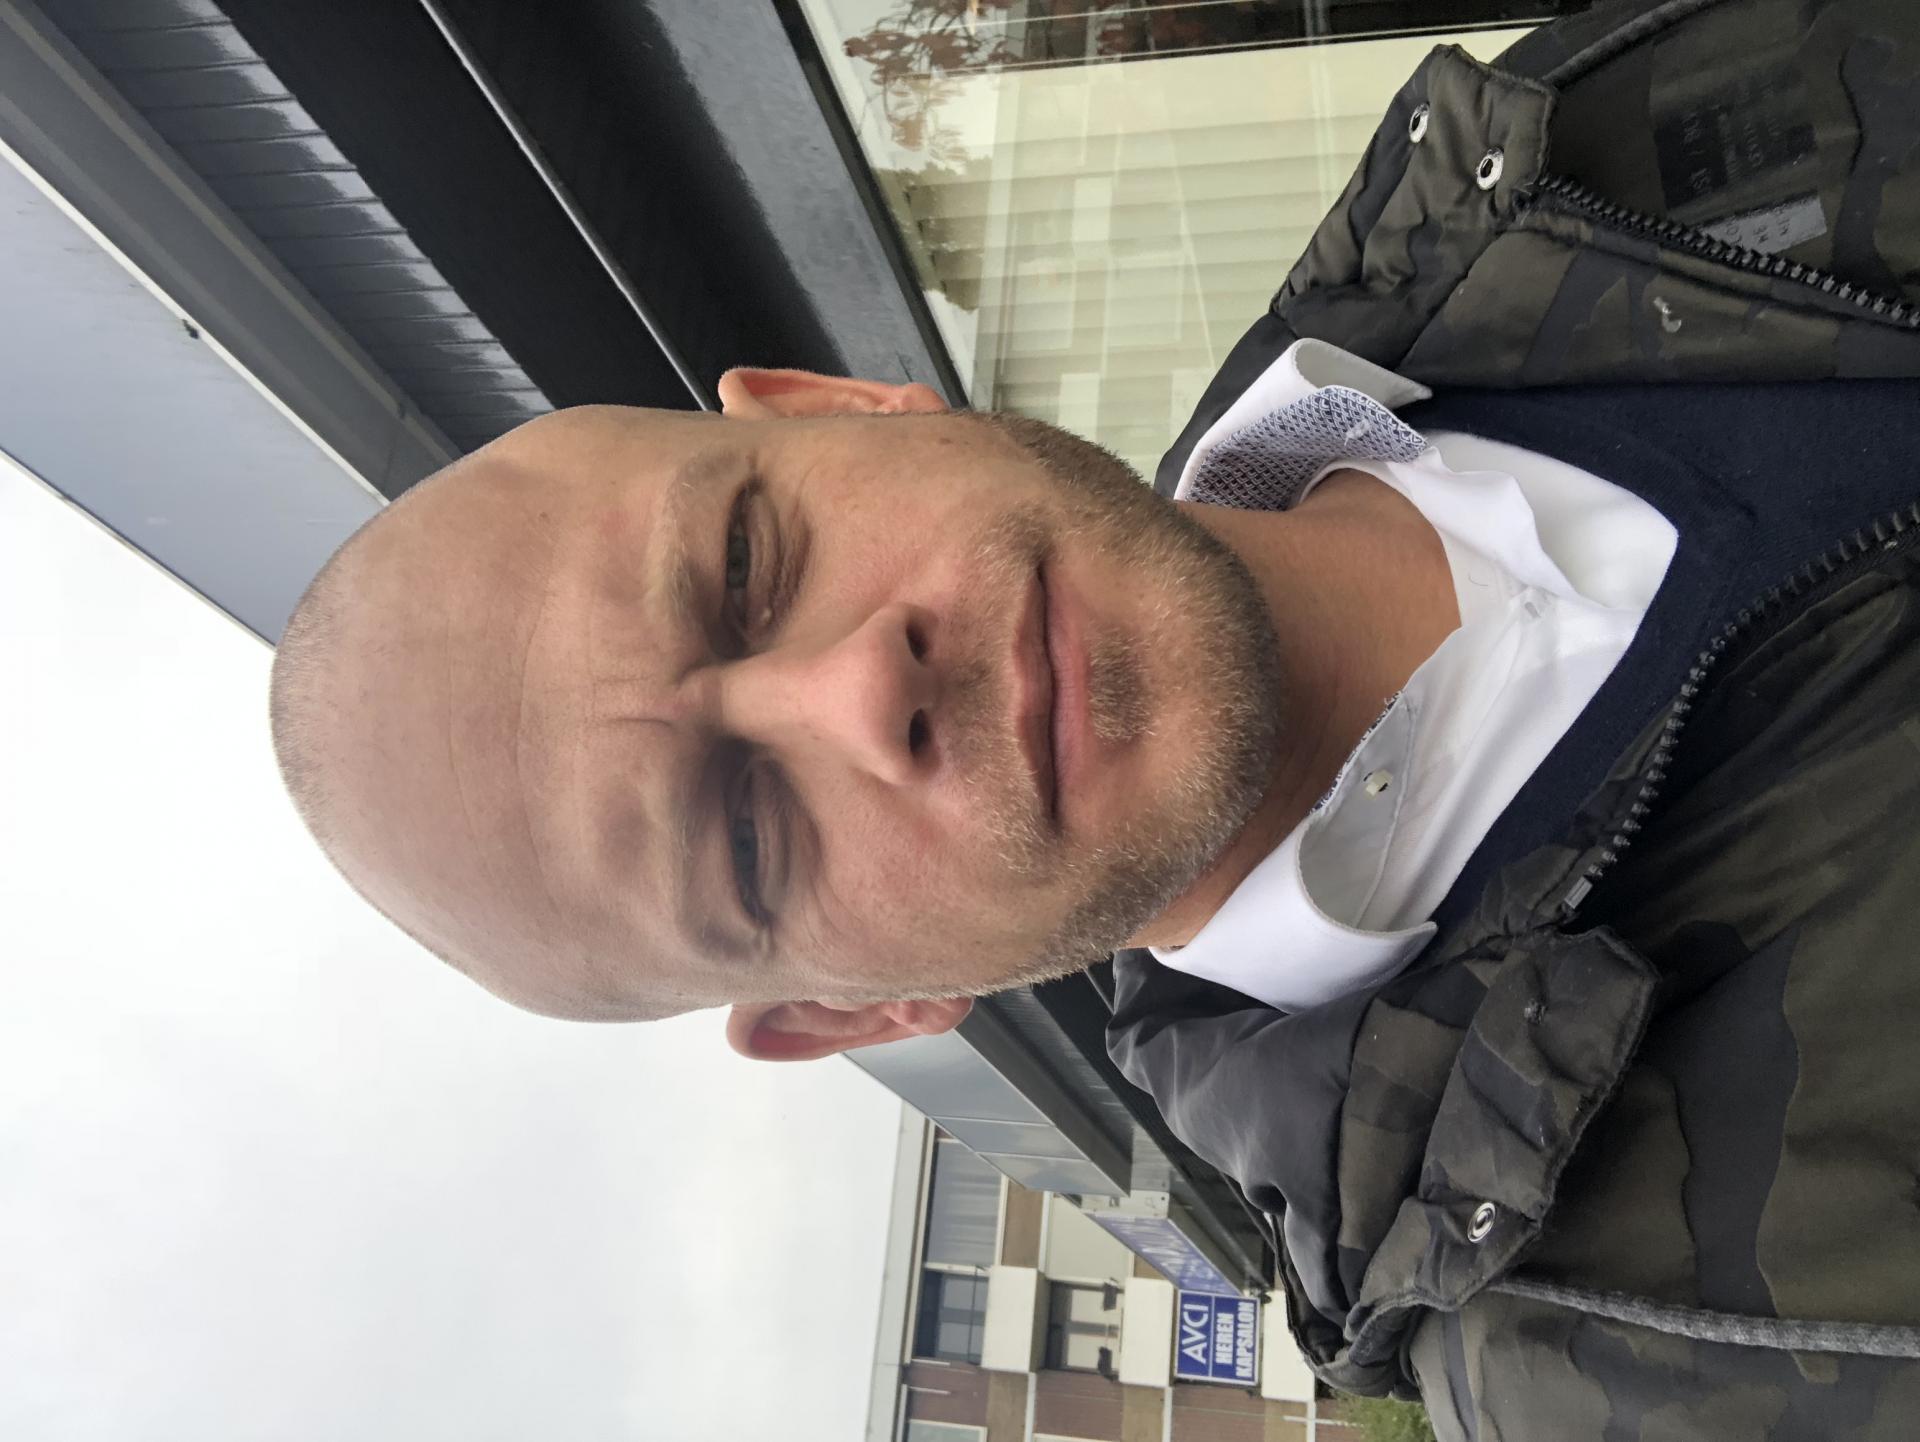 Jeffrey uit Vlaams-Brabant,Belgie